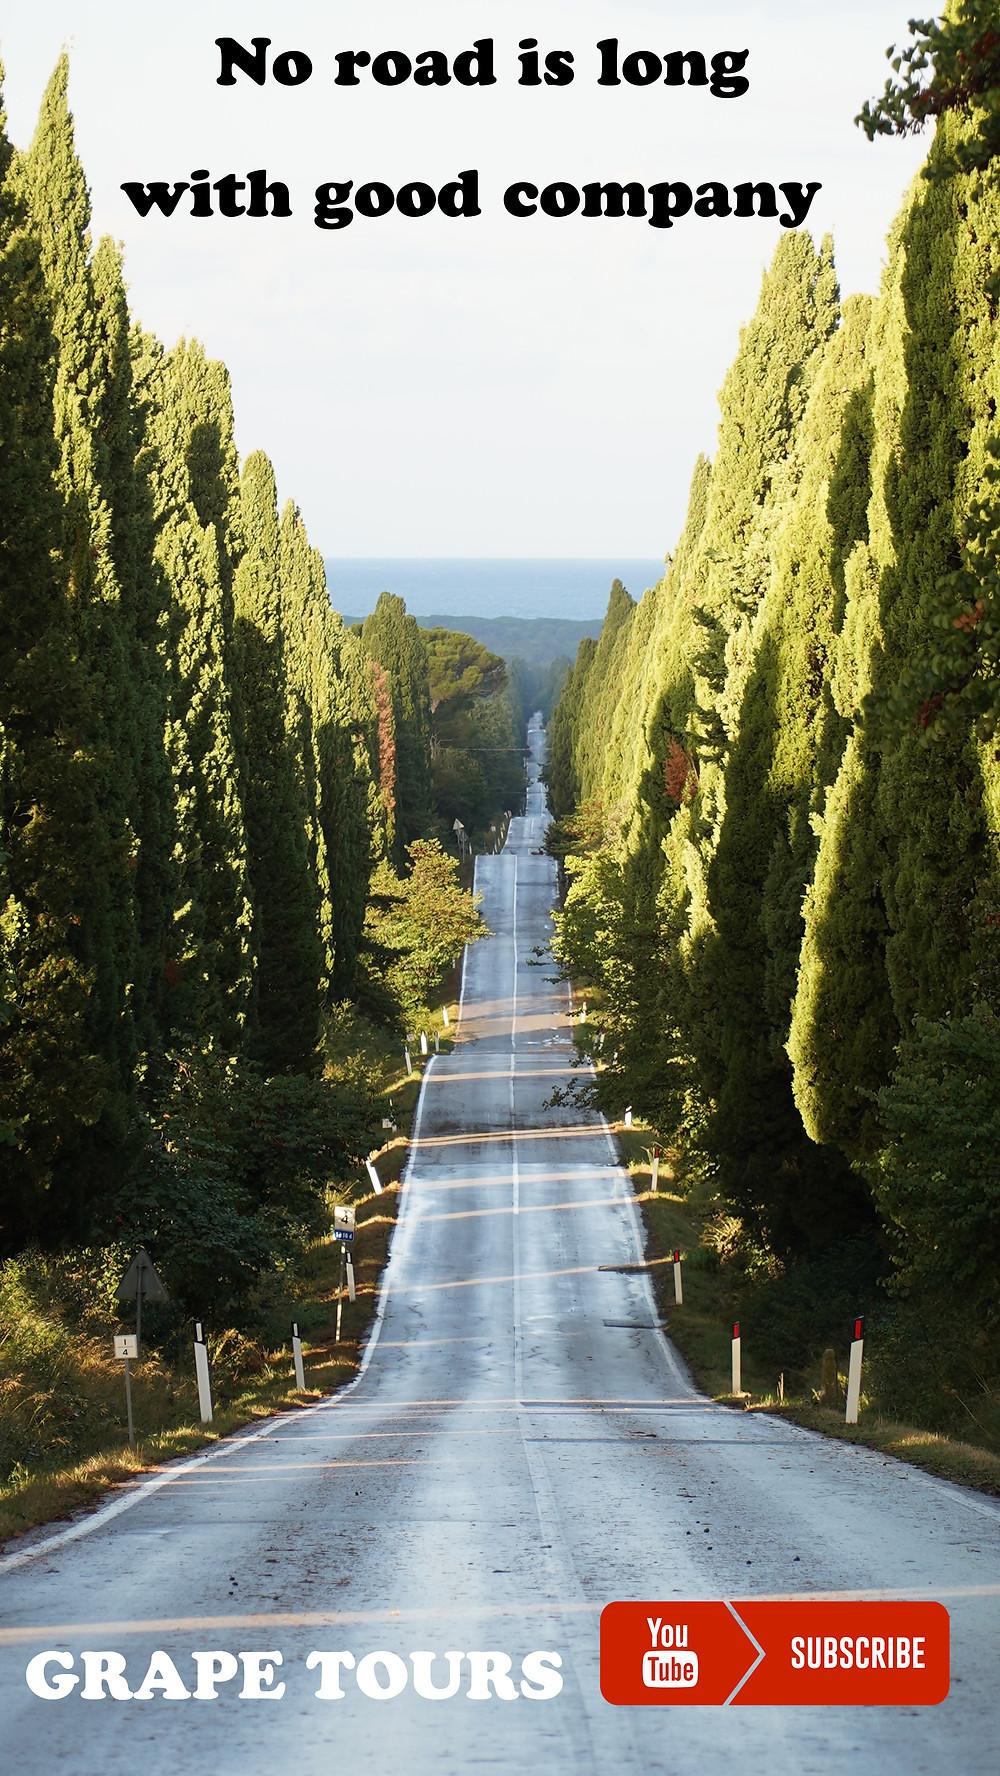 Viale dei Ciipressi, Bolgheri.